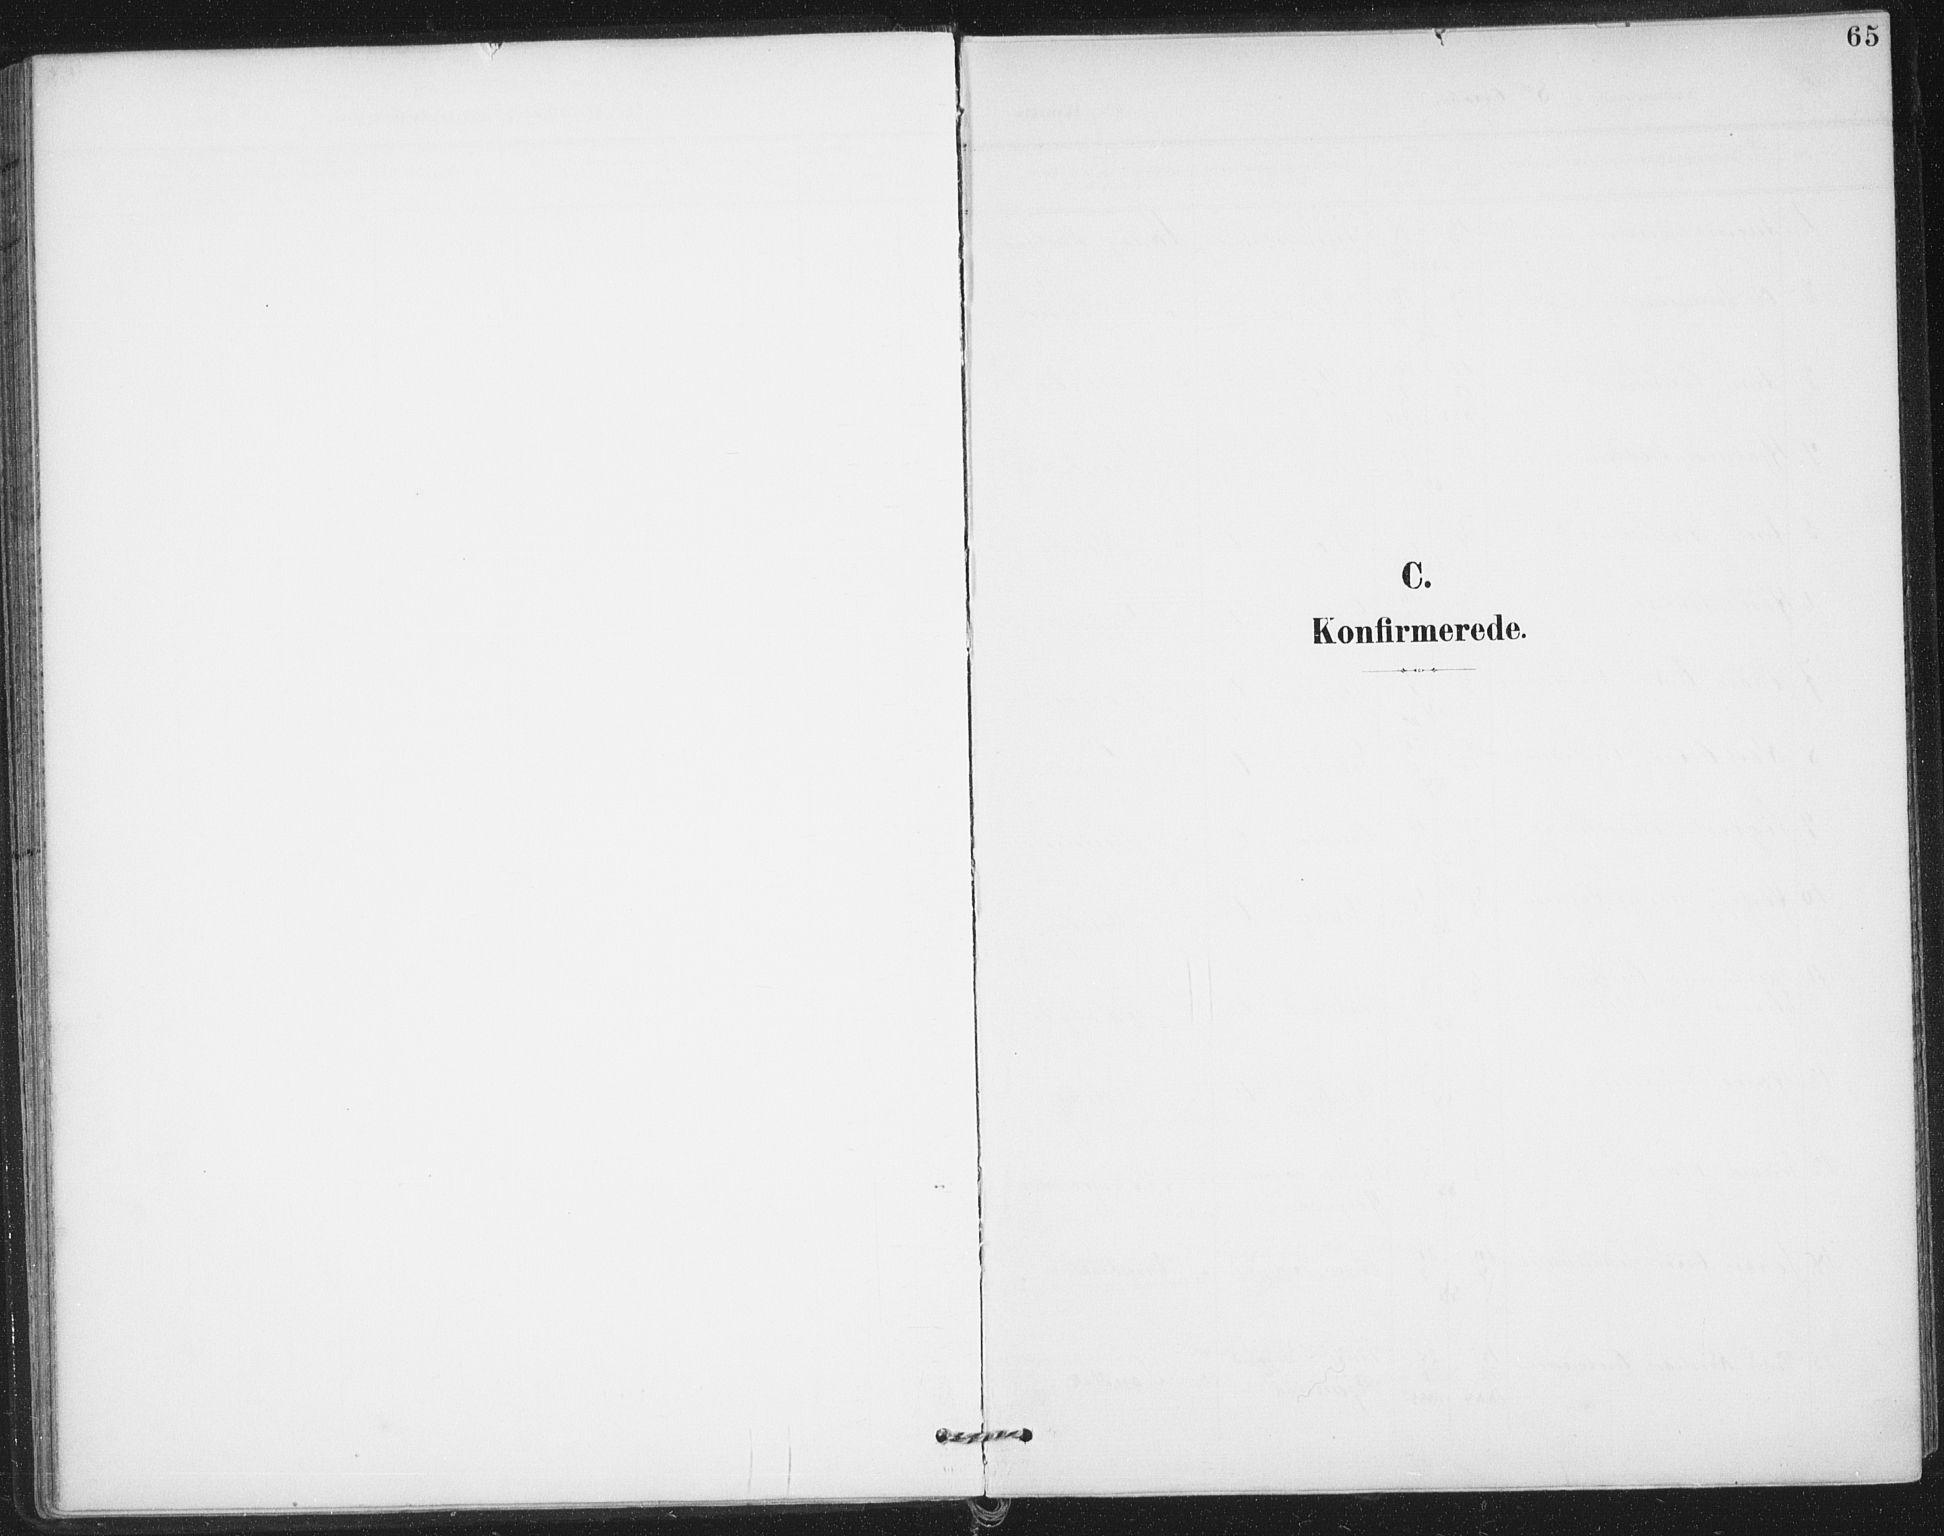 SAO, Varteig prestekontor Kirkebøker, F/Fa/L0003: Ministerialbok nr. 3, 1899-1919, s. 65